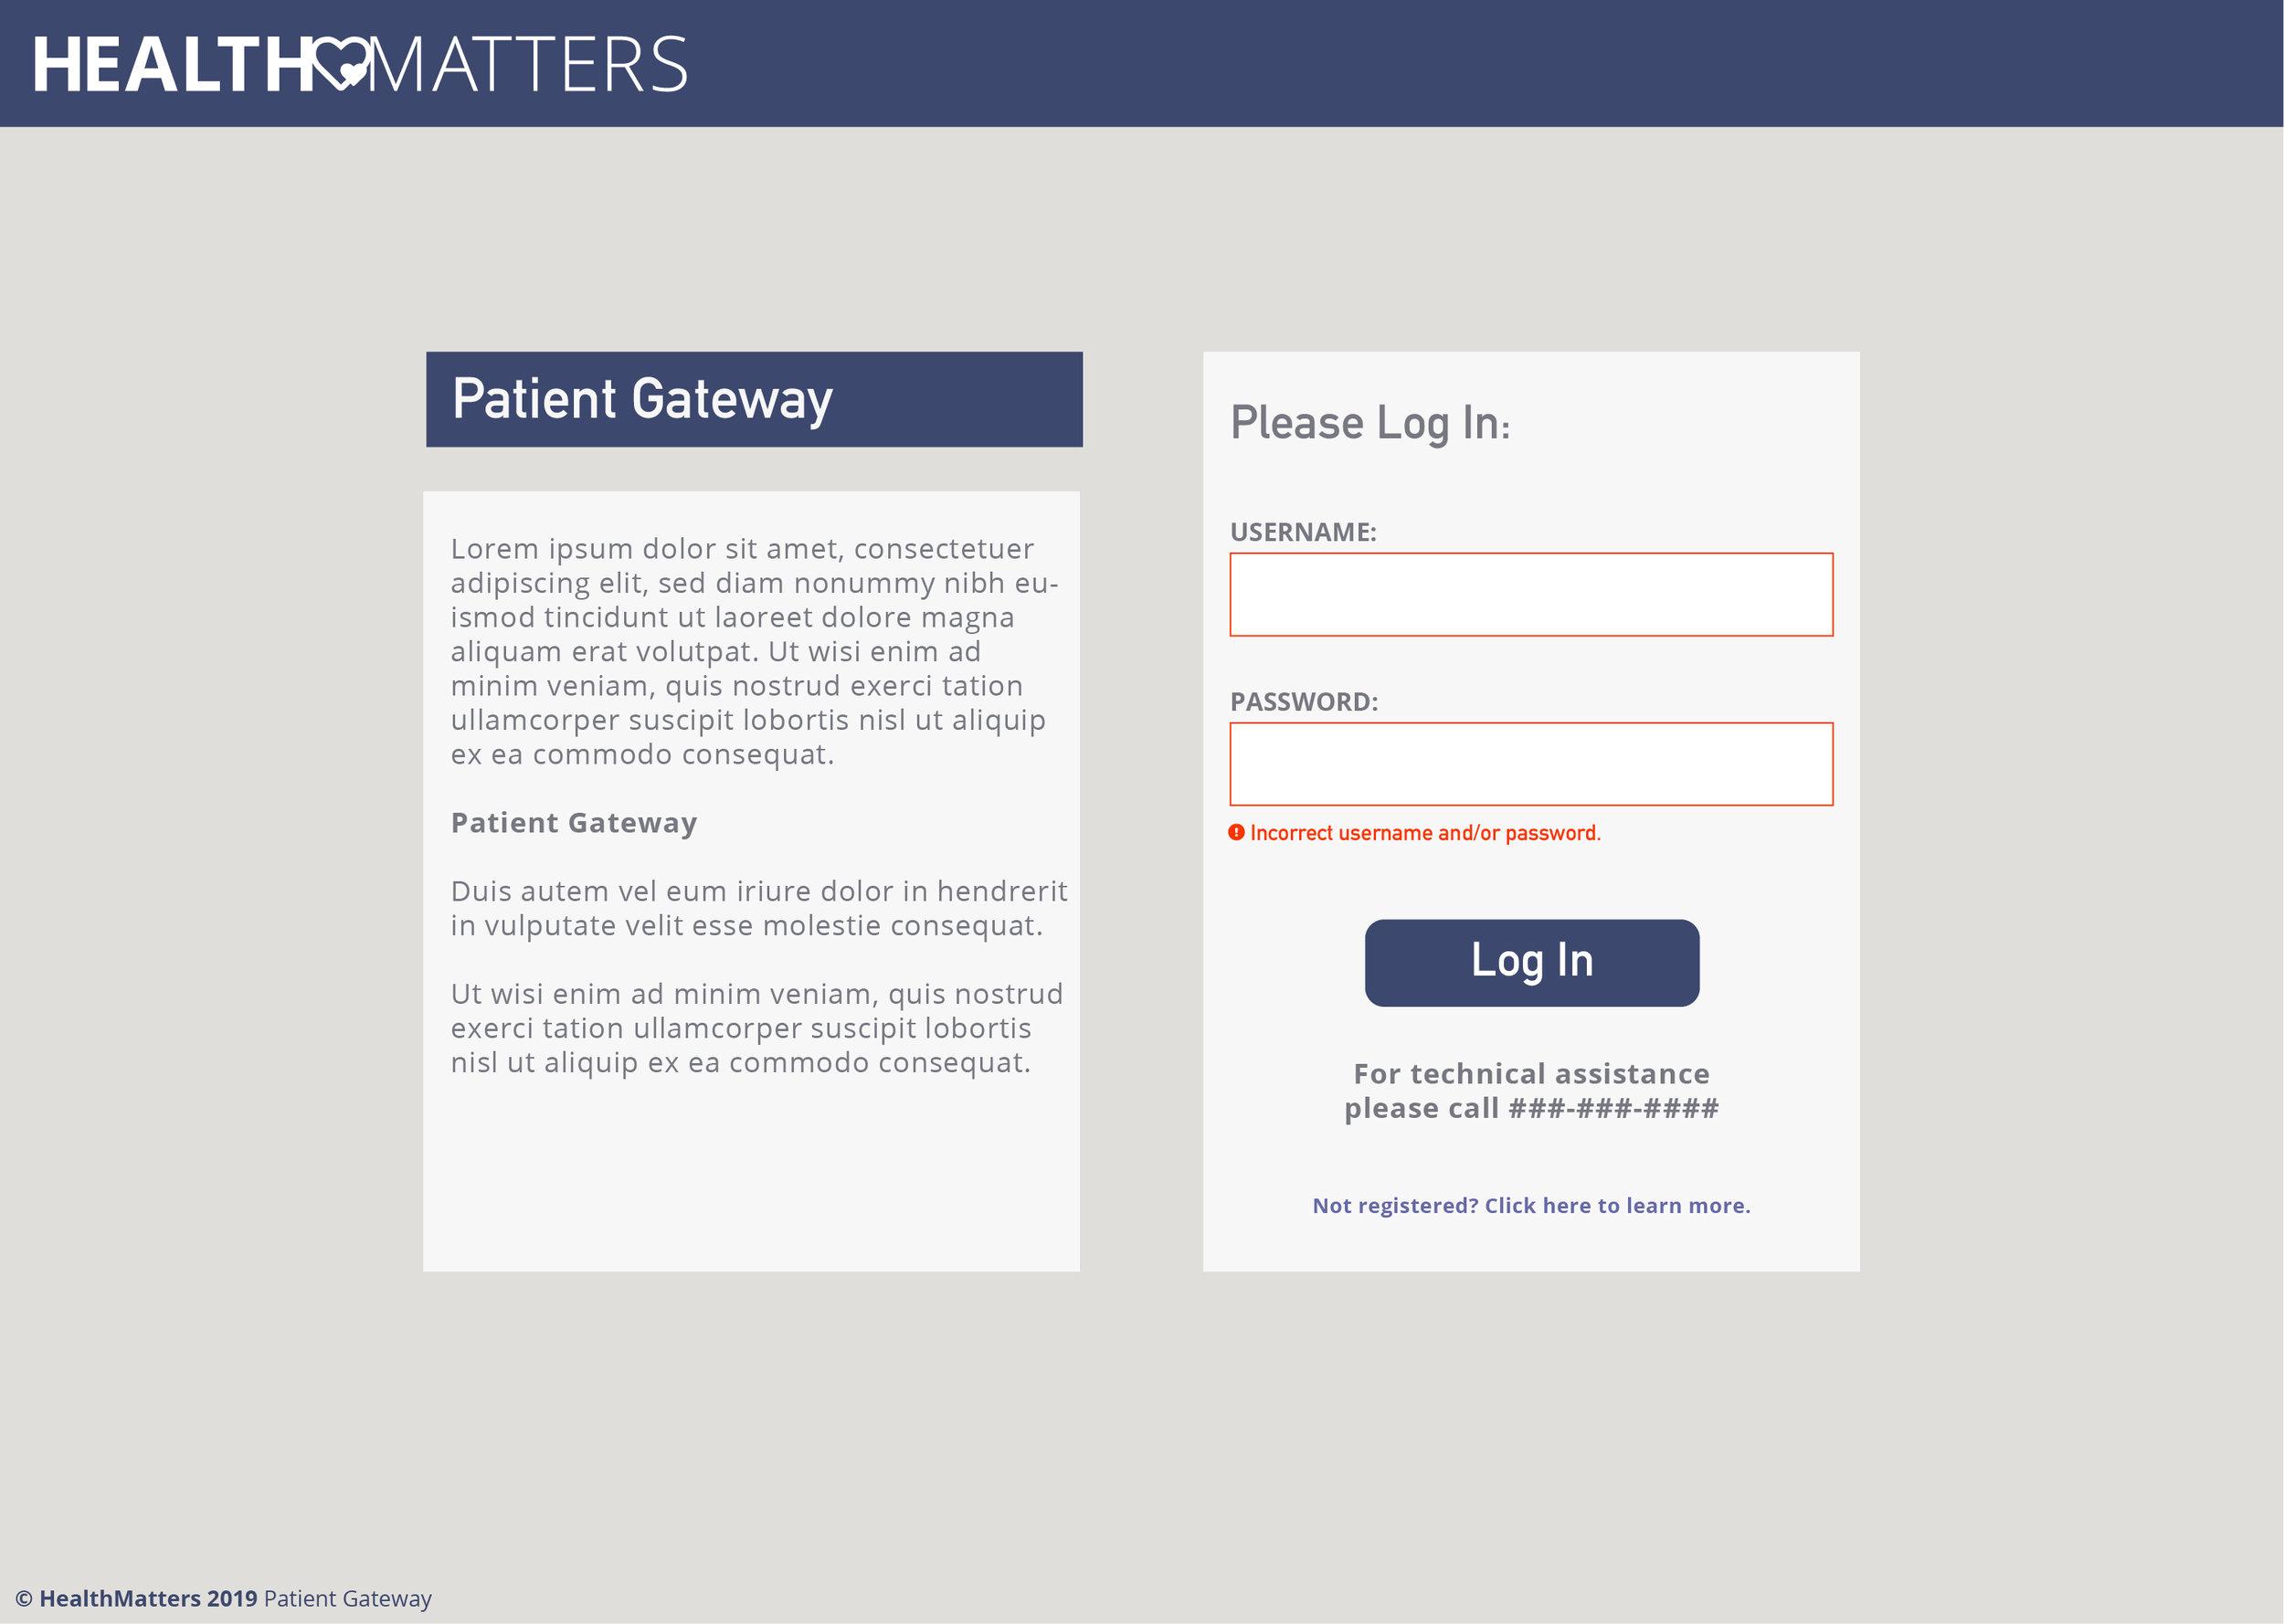 HEALTHMATTERS_Fake_Pages_Login Error State.jpg